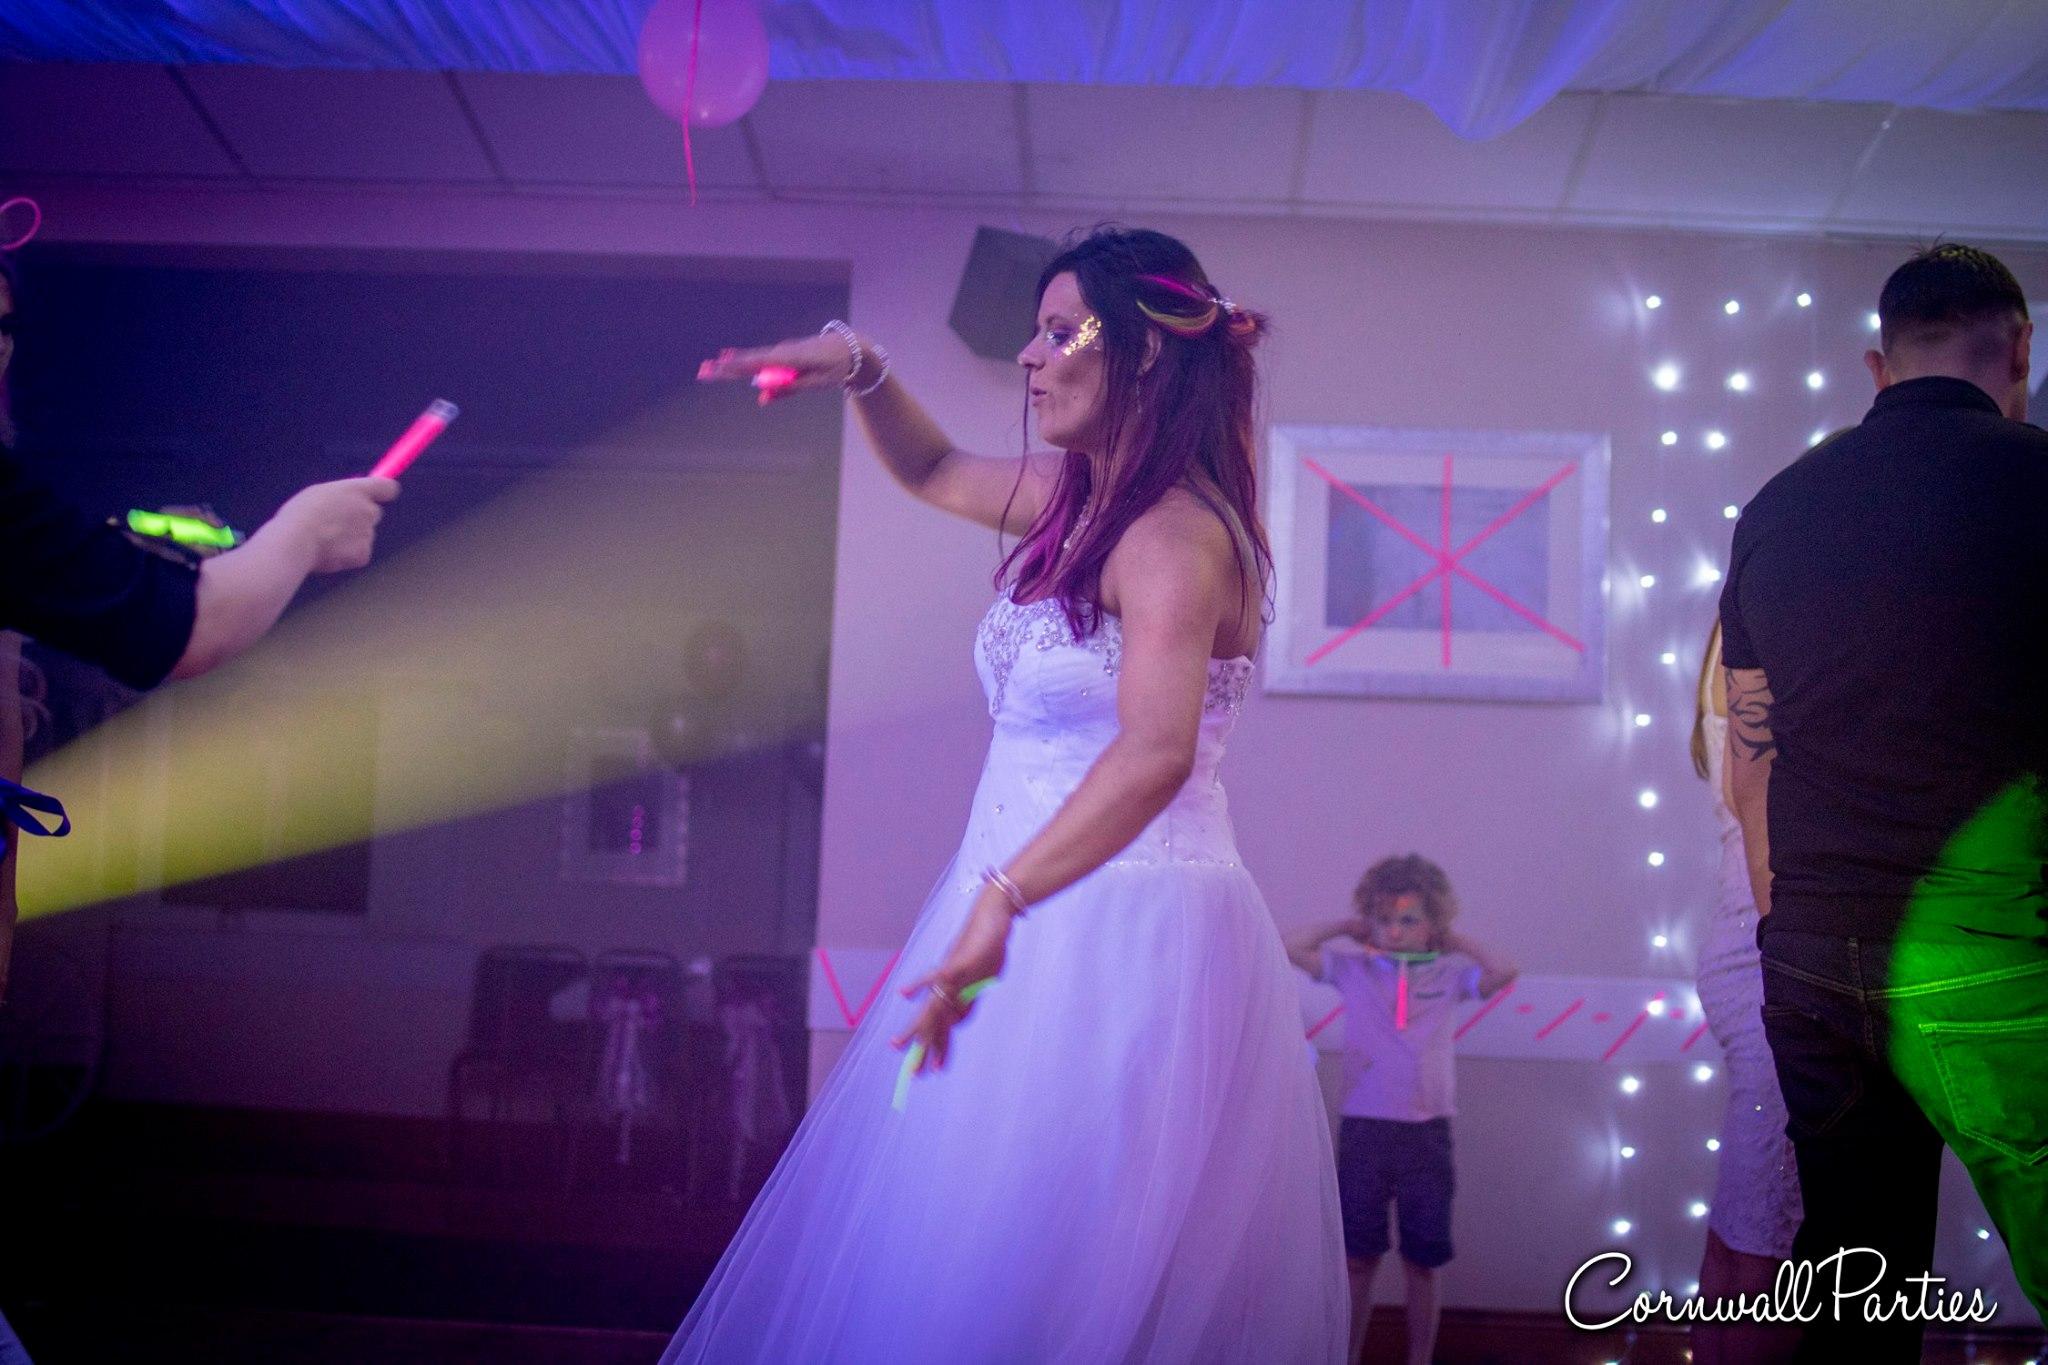 cornwall wedding disco dj photographer 29